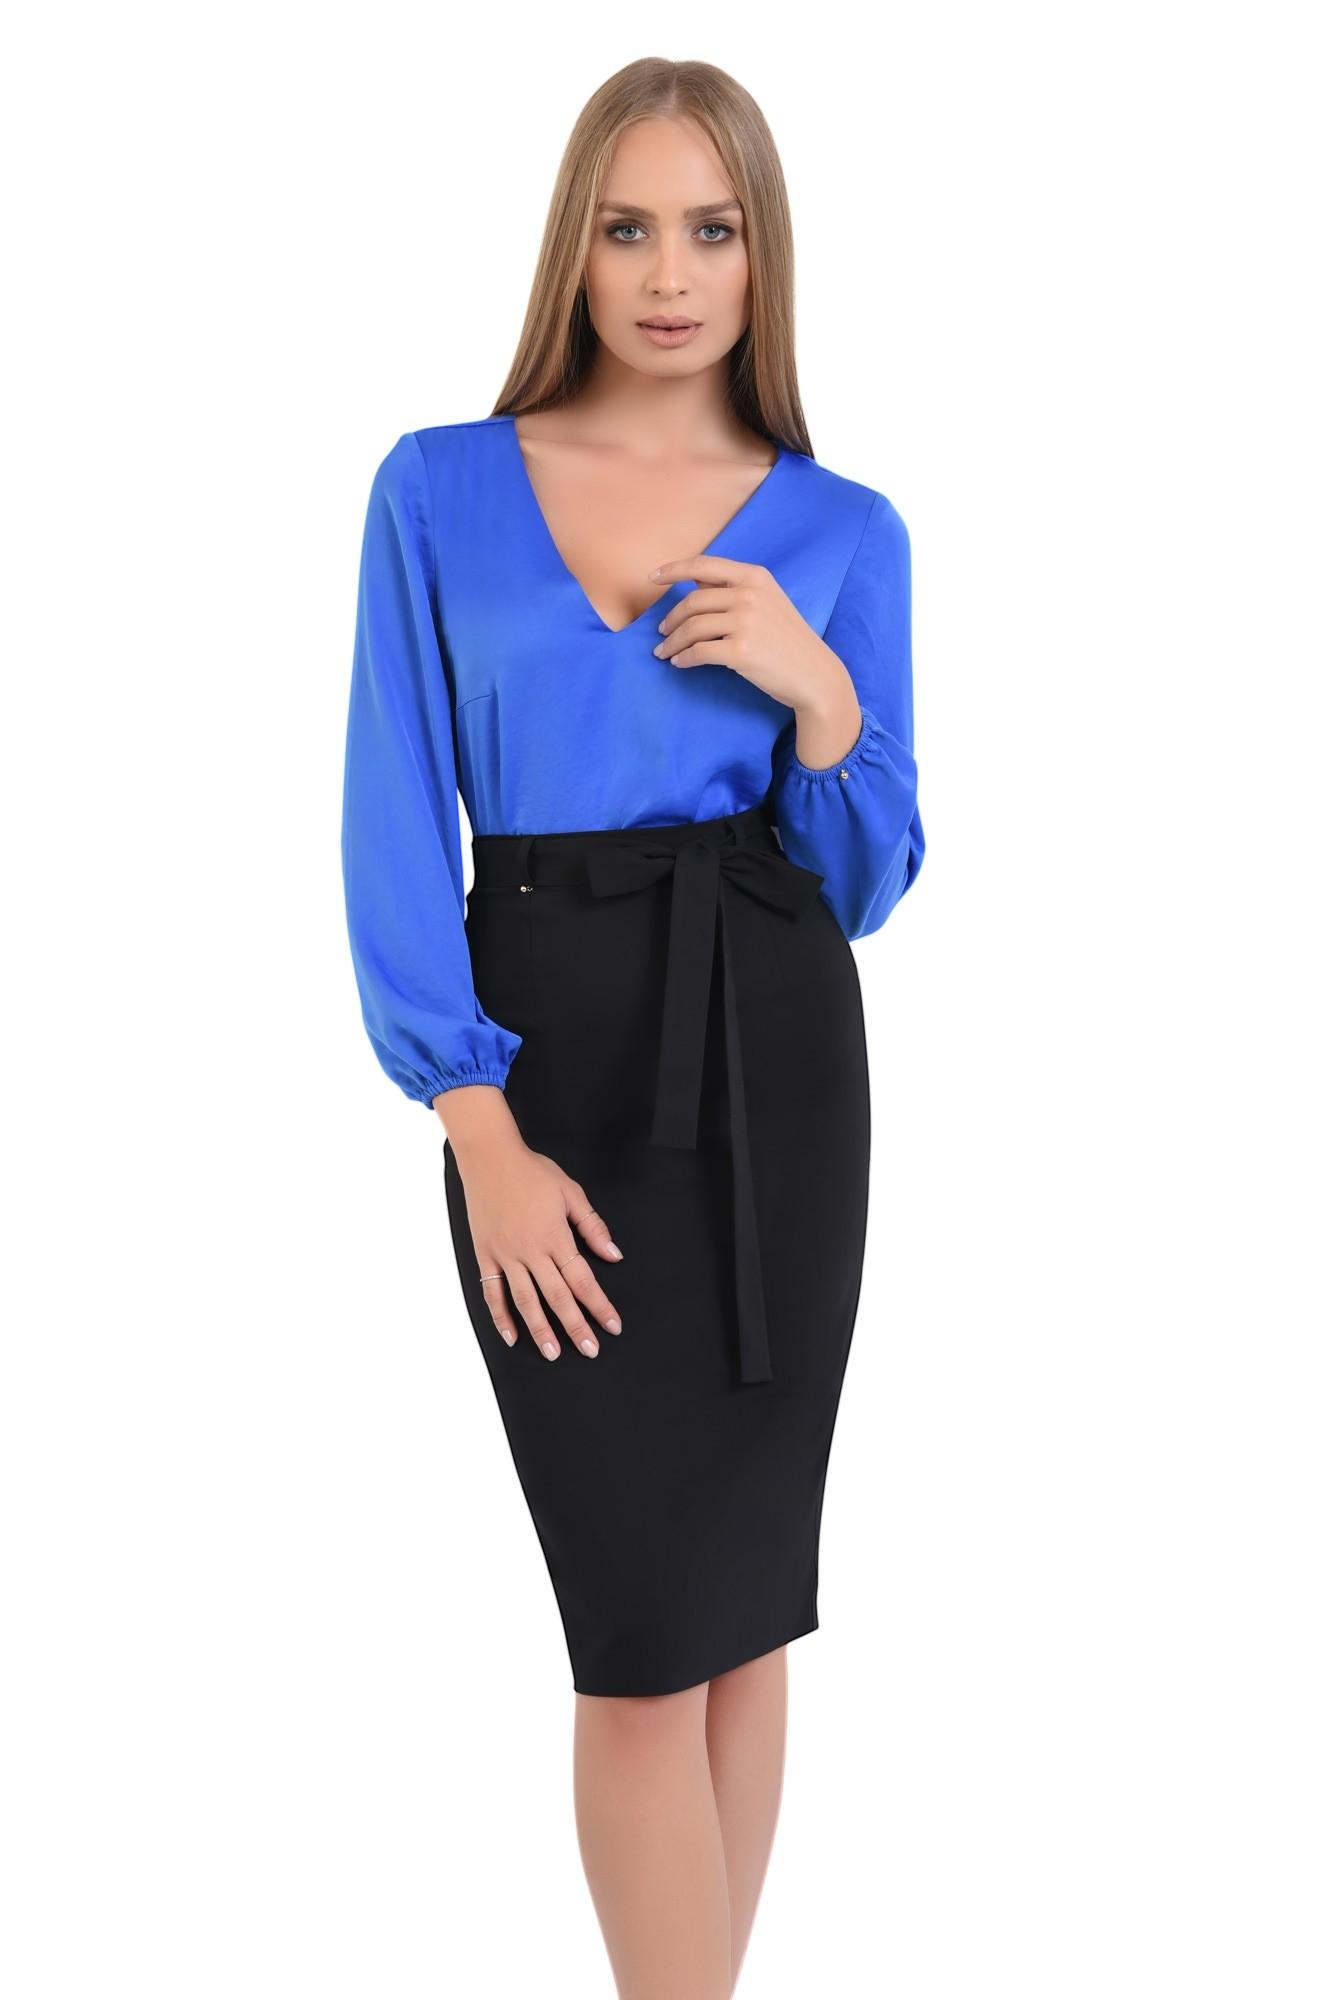 0 - bluza office cu anchior, tesatura satinata, bluze online